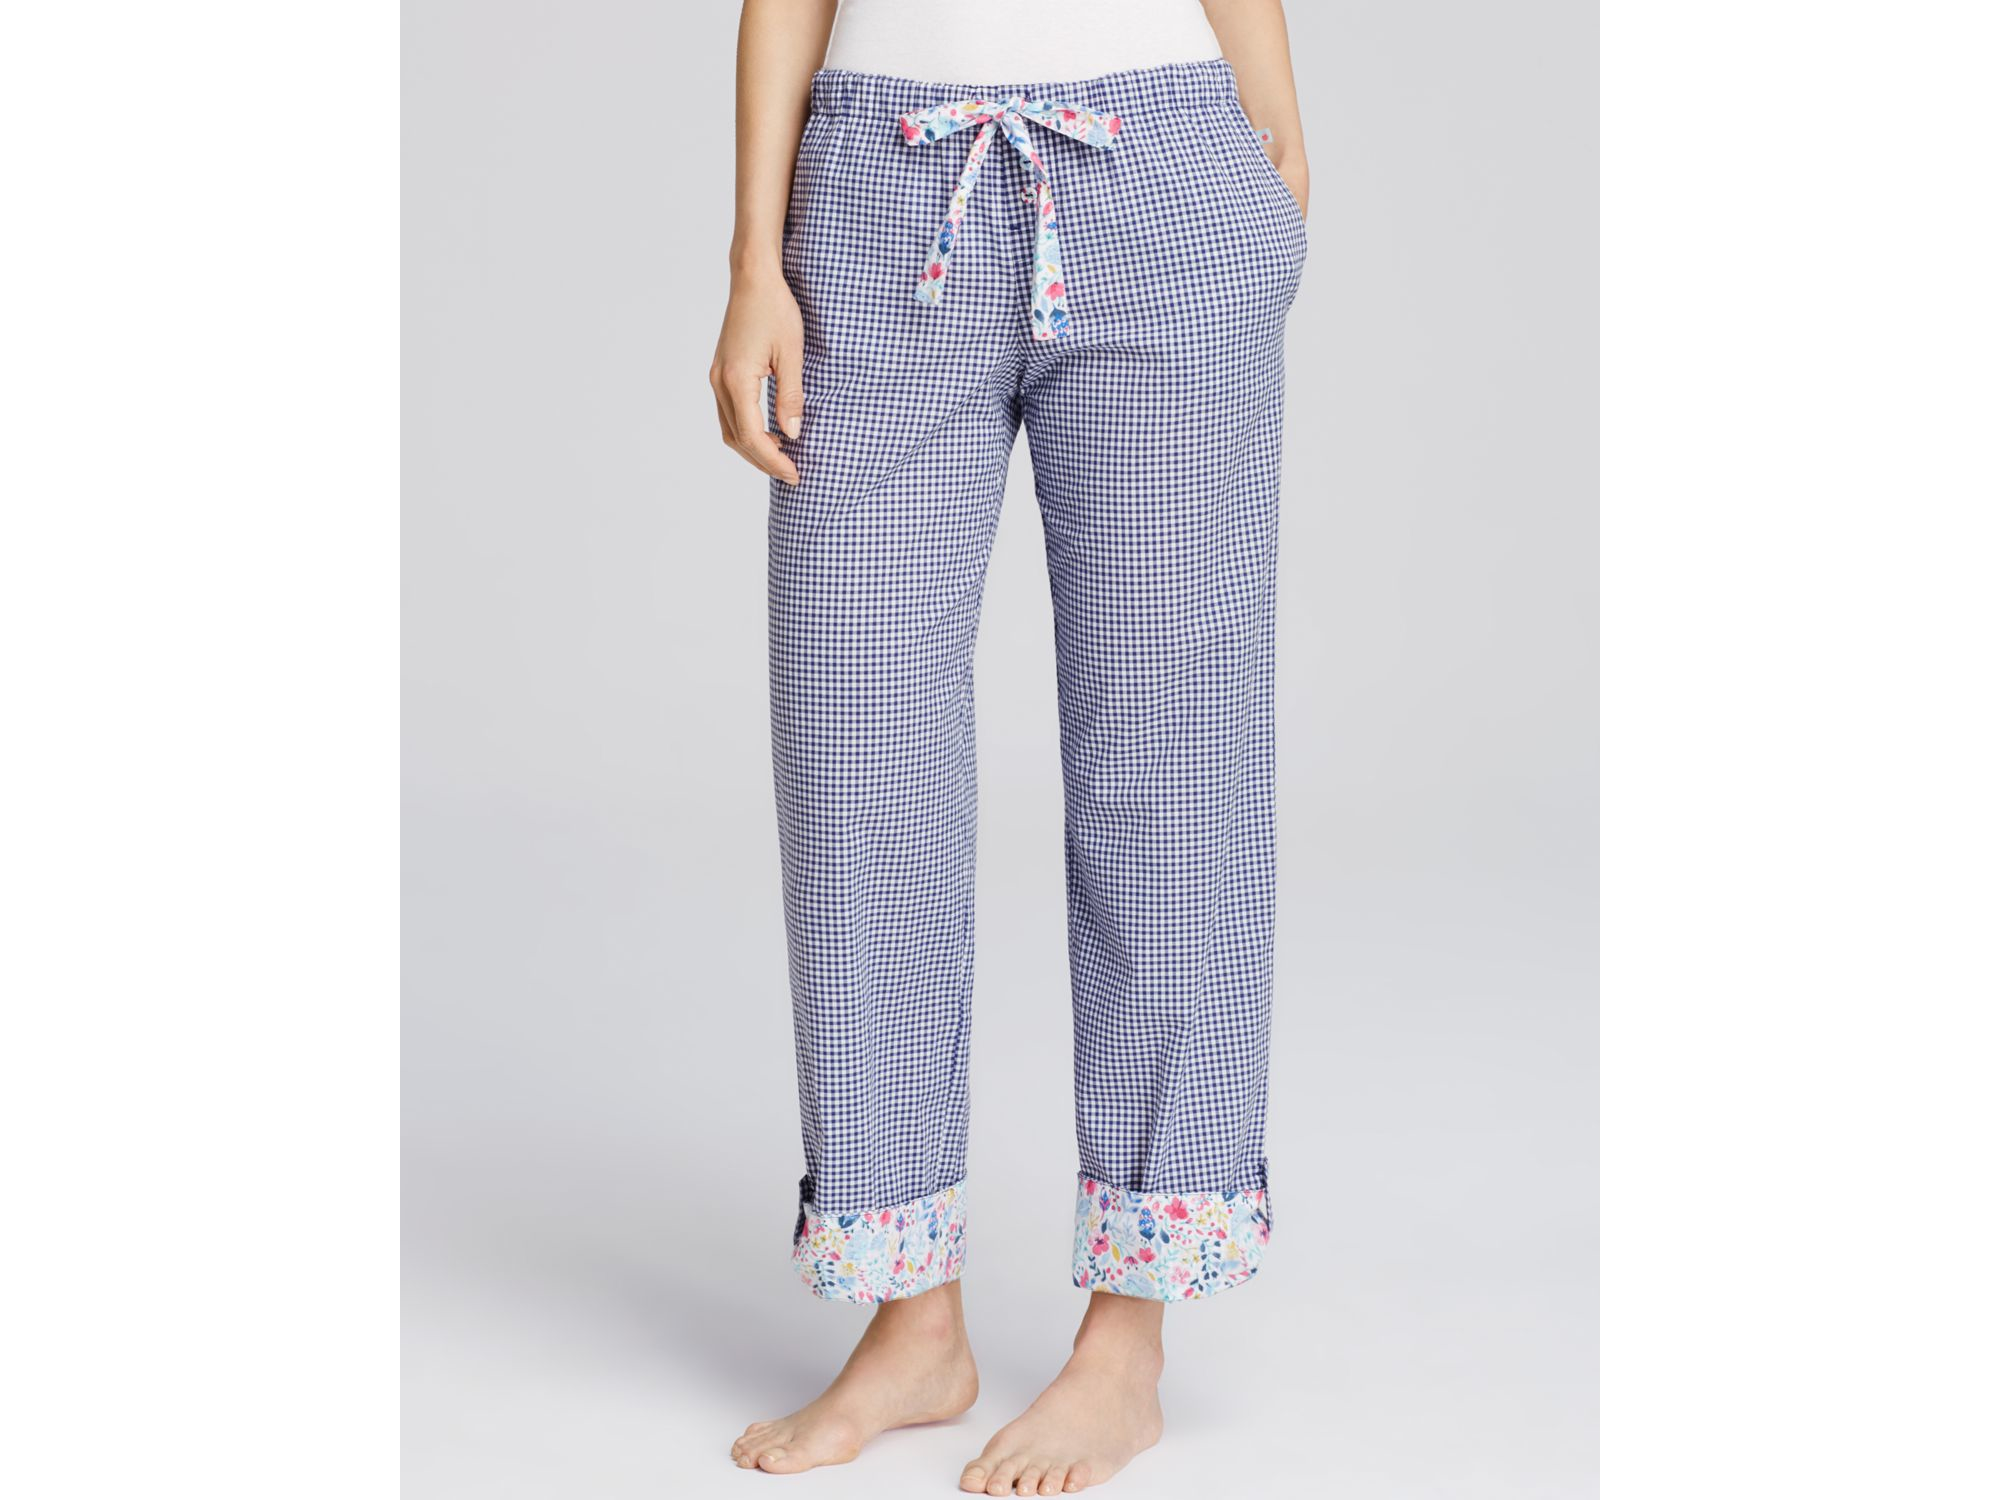 96f2f3fb3dc6 Jane & Bleecker New York Gingham Batiste Pajama Pants in Blue - Lyst